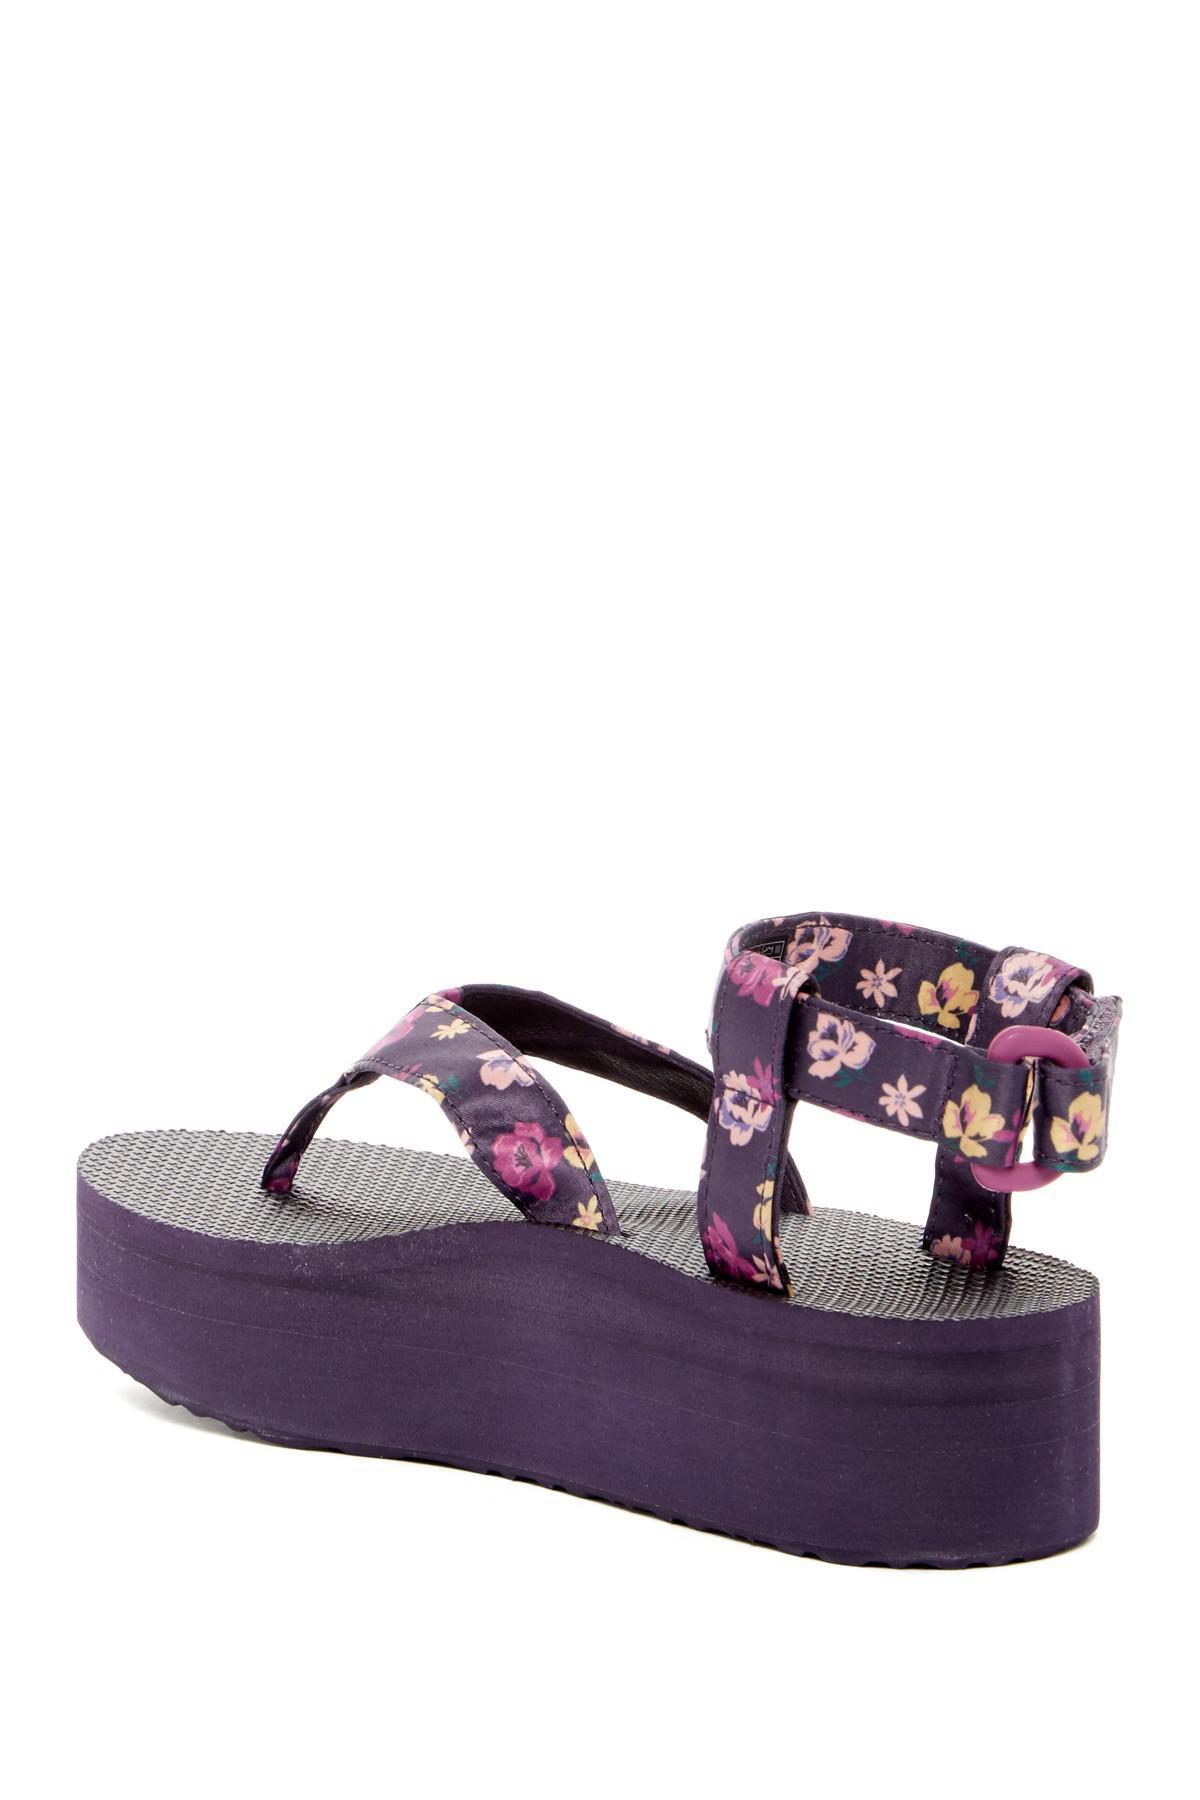 0ba893d4048a Lyst - Teva Floral Flatform Thong Sandal in Purple